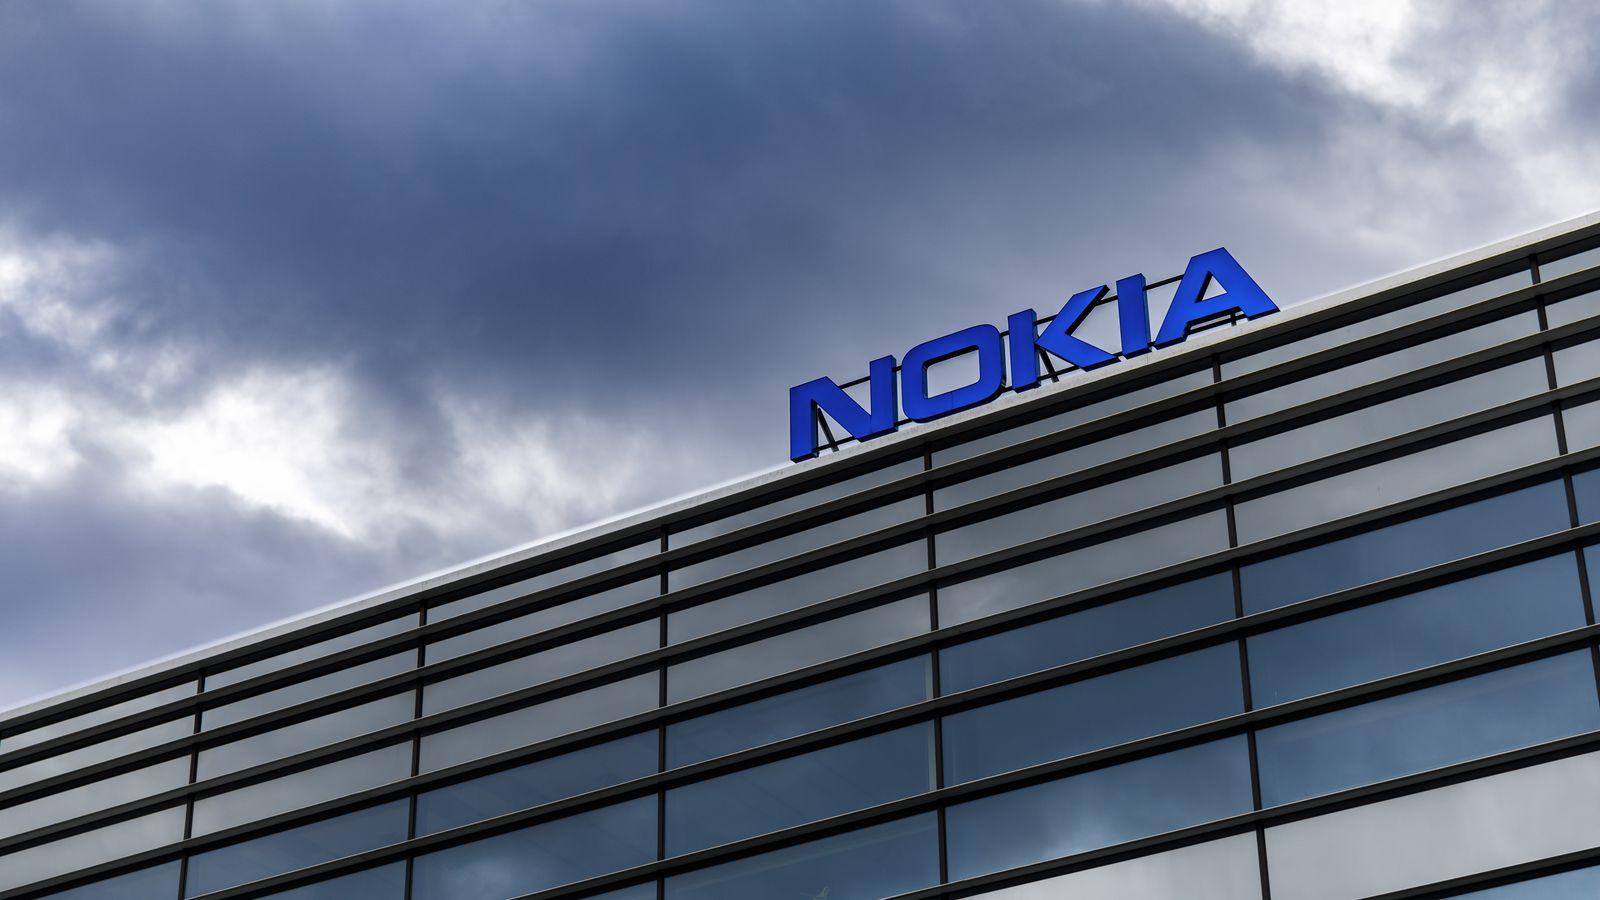 NOK Stock: Will the 5G Revolution Bring Upside to Nokia? | InvestorPlace